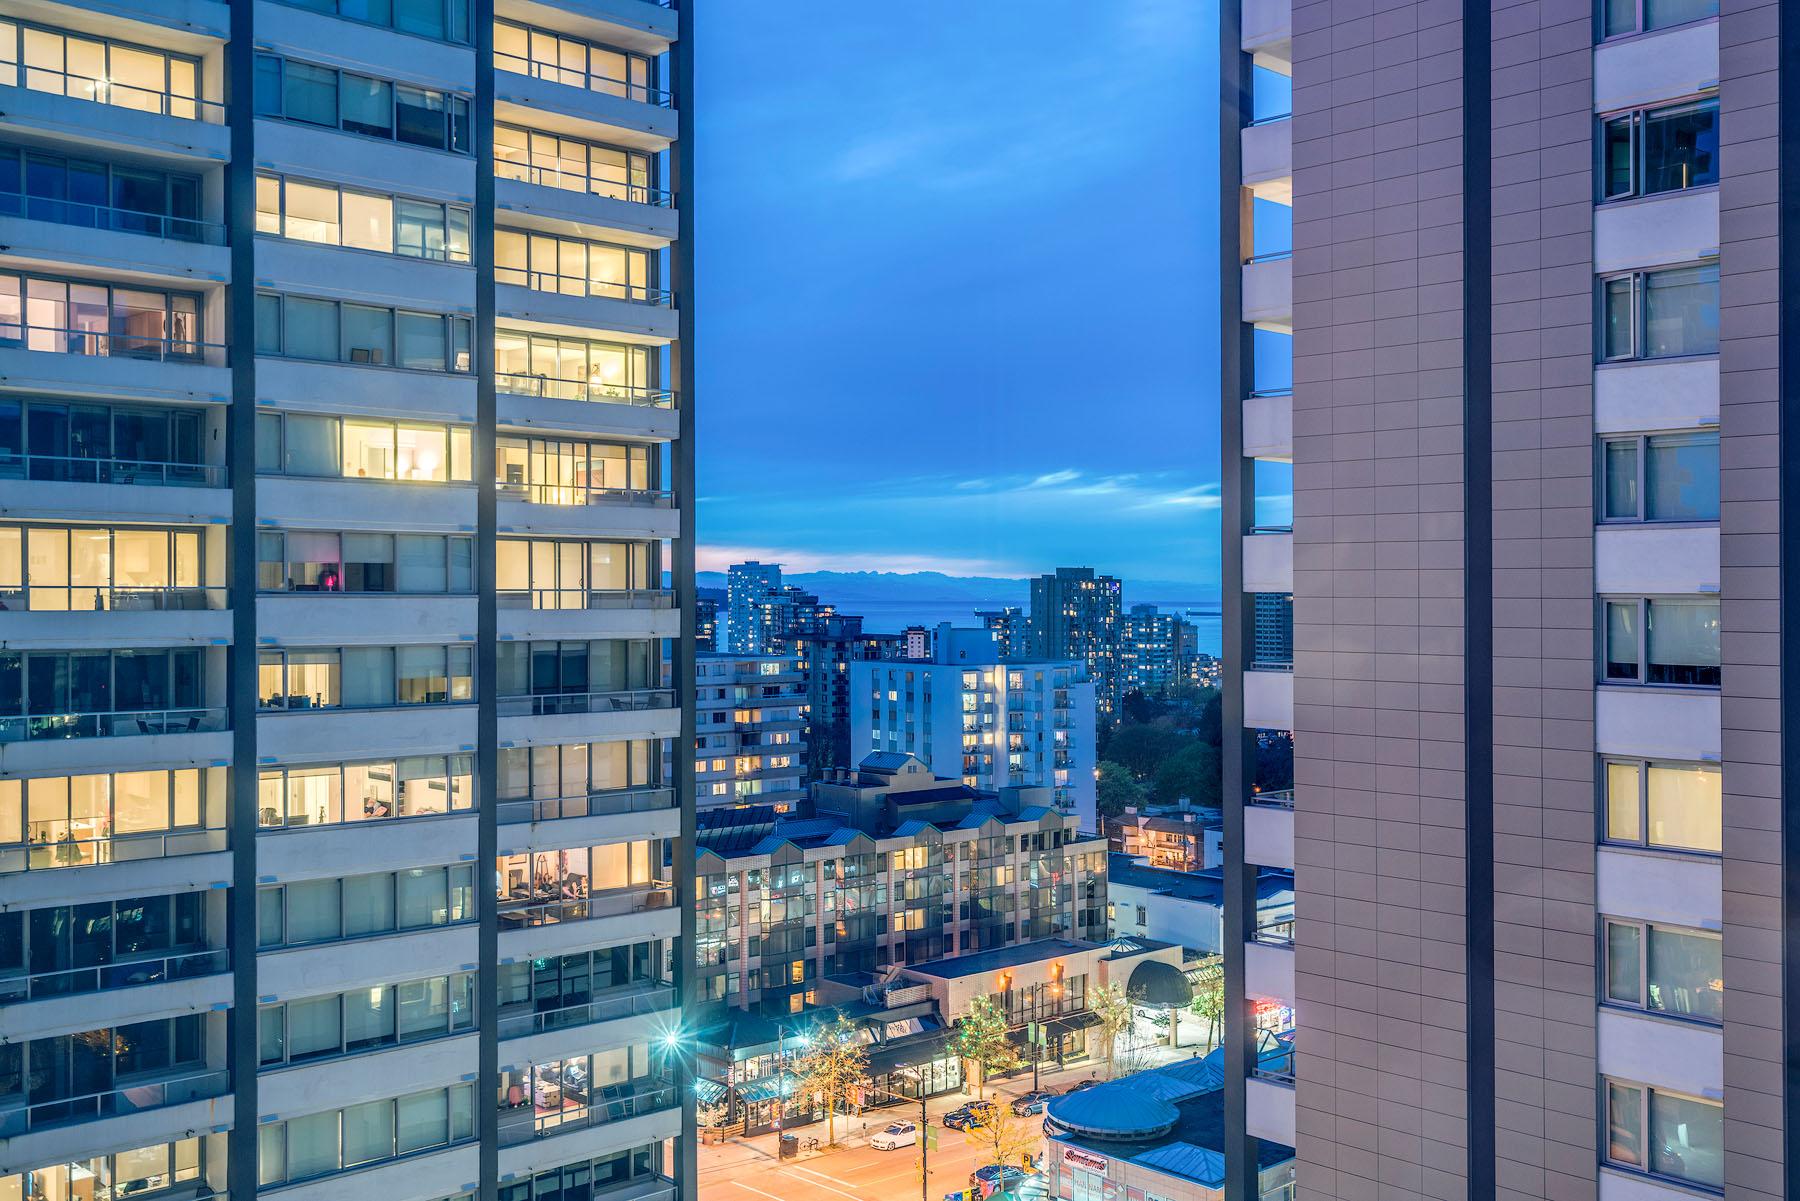 1605-1288-Alberni-Street-Vancouver-360hometours-21s.jpg